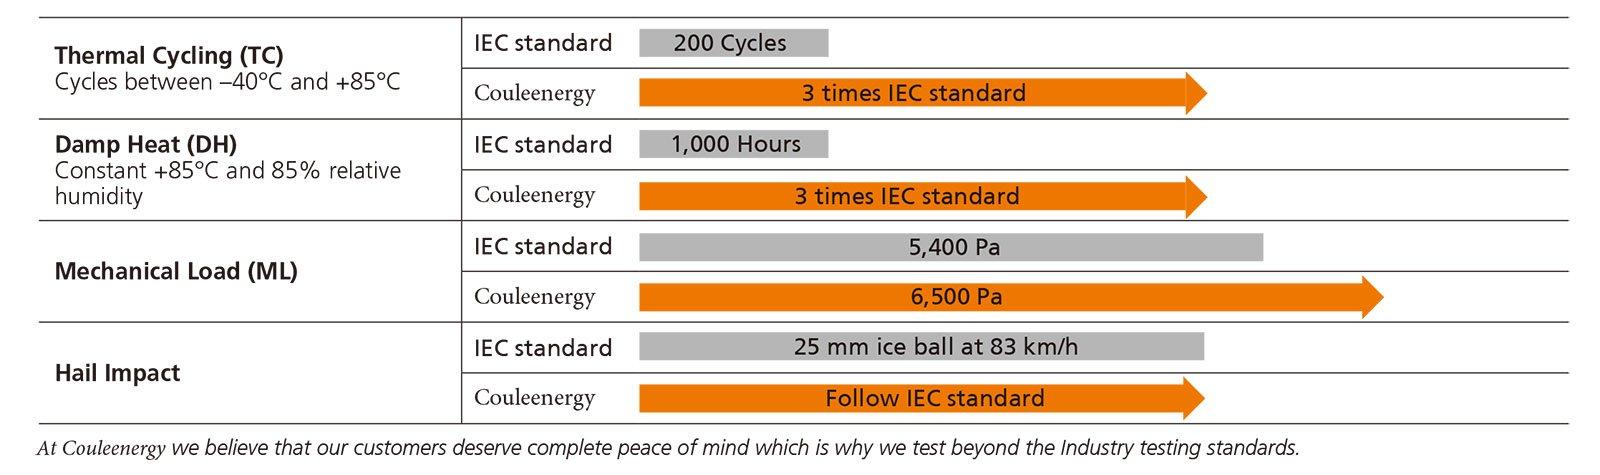 solar panel standard testing